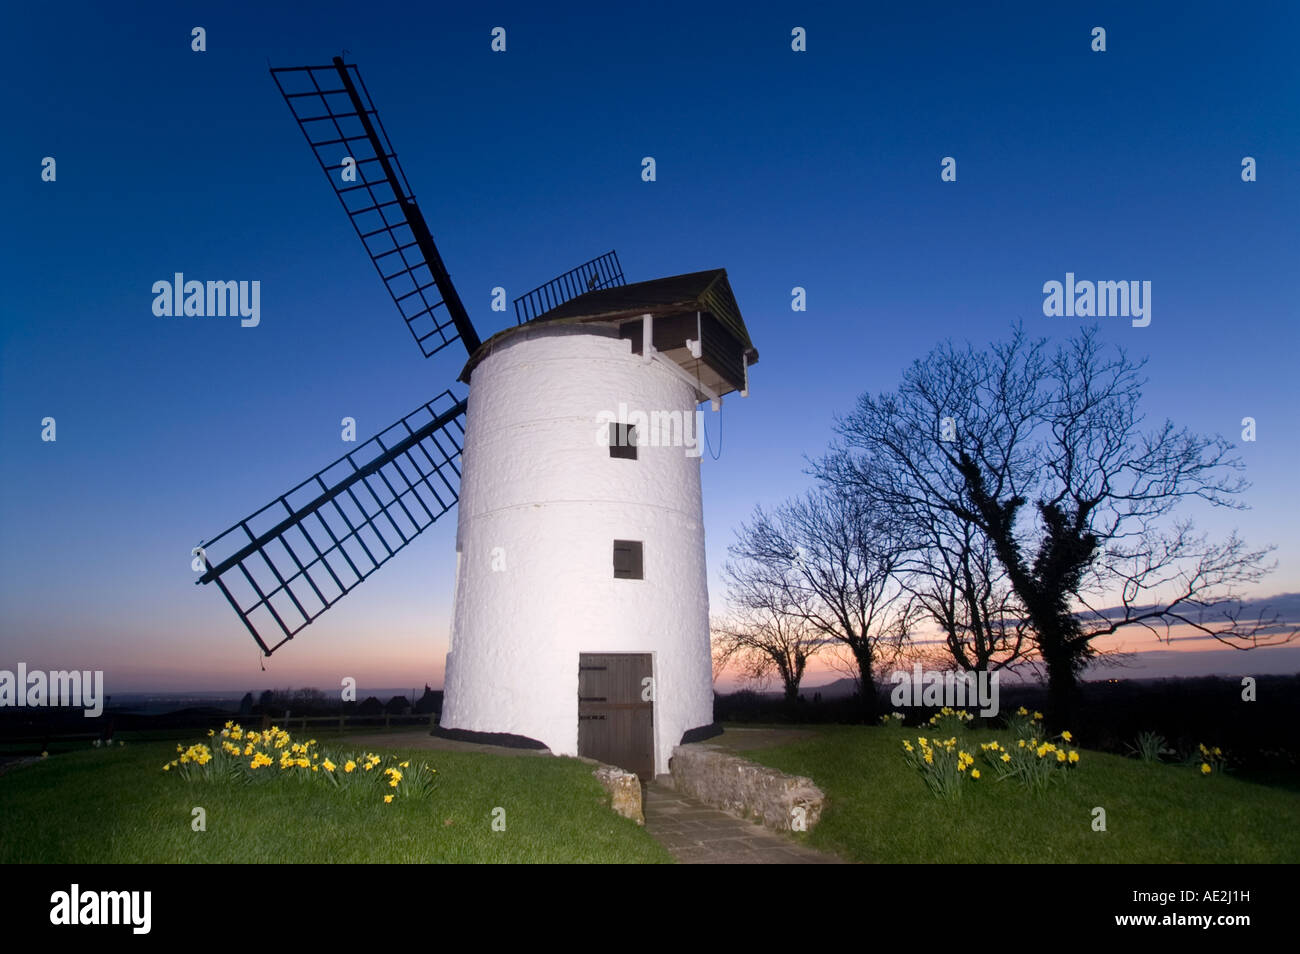 Ashton Windmill at Chapel Allerton near Axminster, Somerset, UK - Stock Image